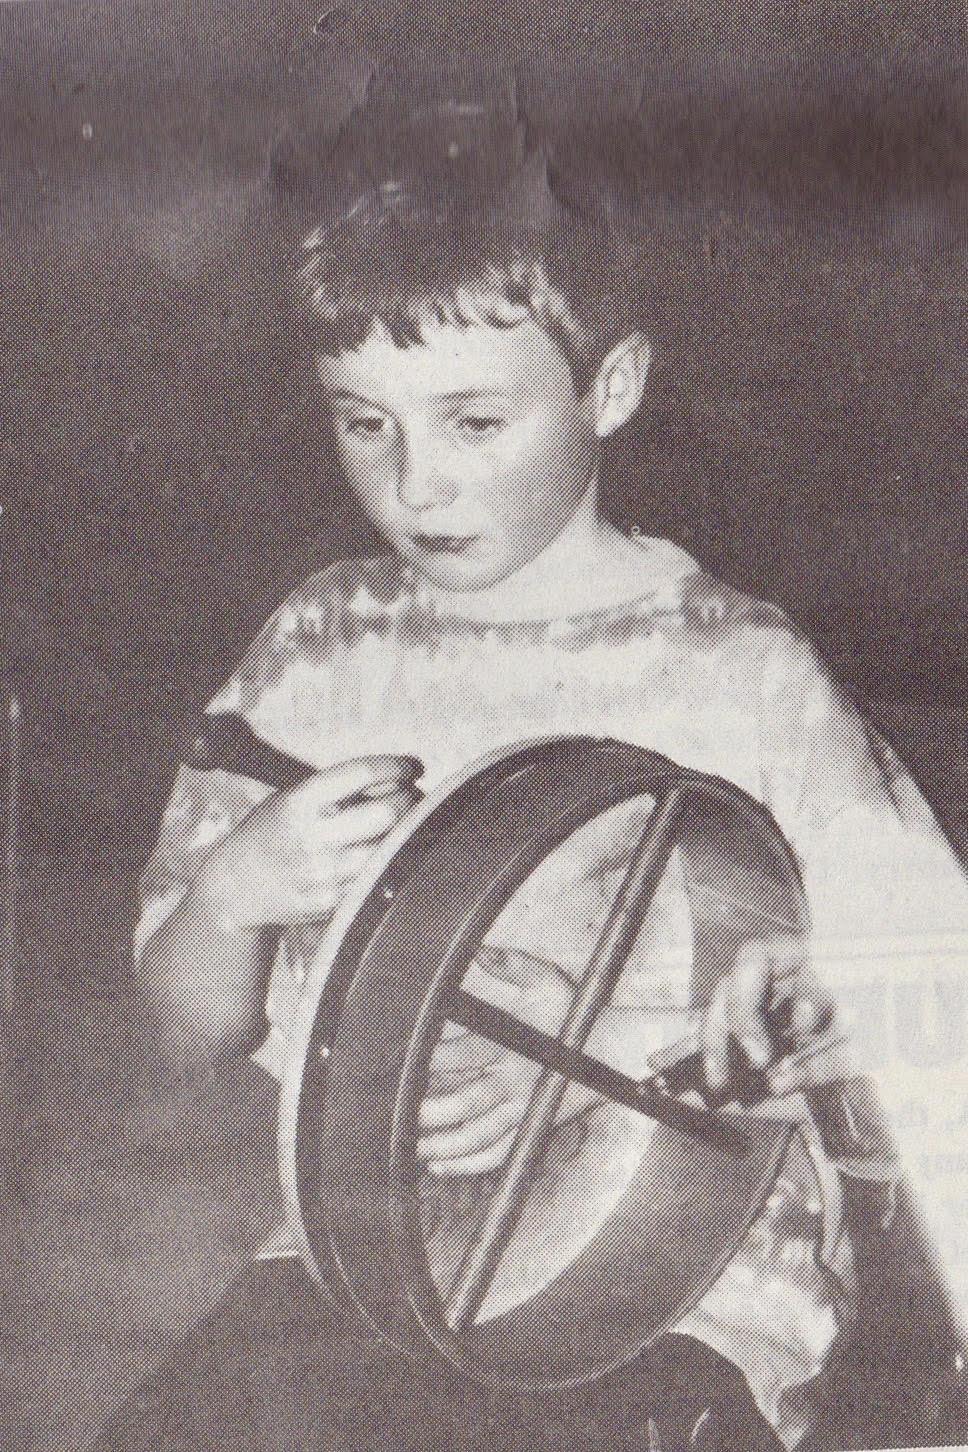 Ruairi Age 8 w bodhran.jpg